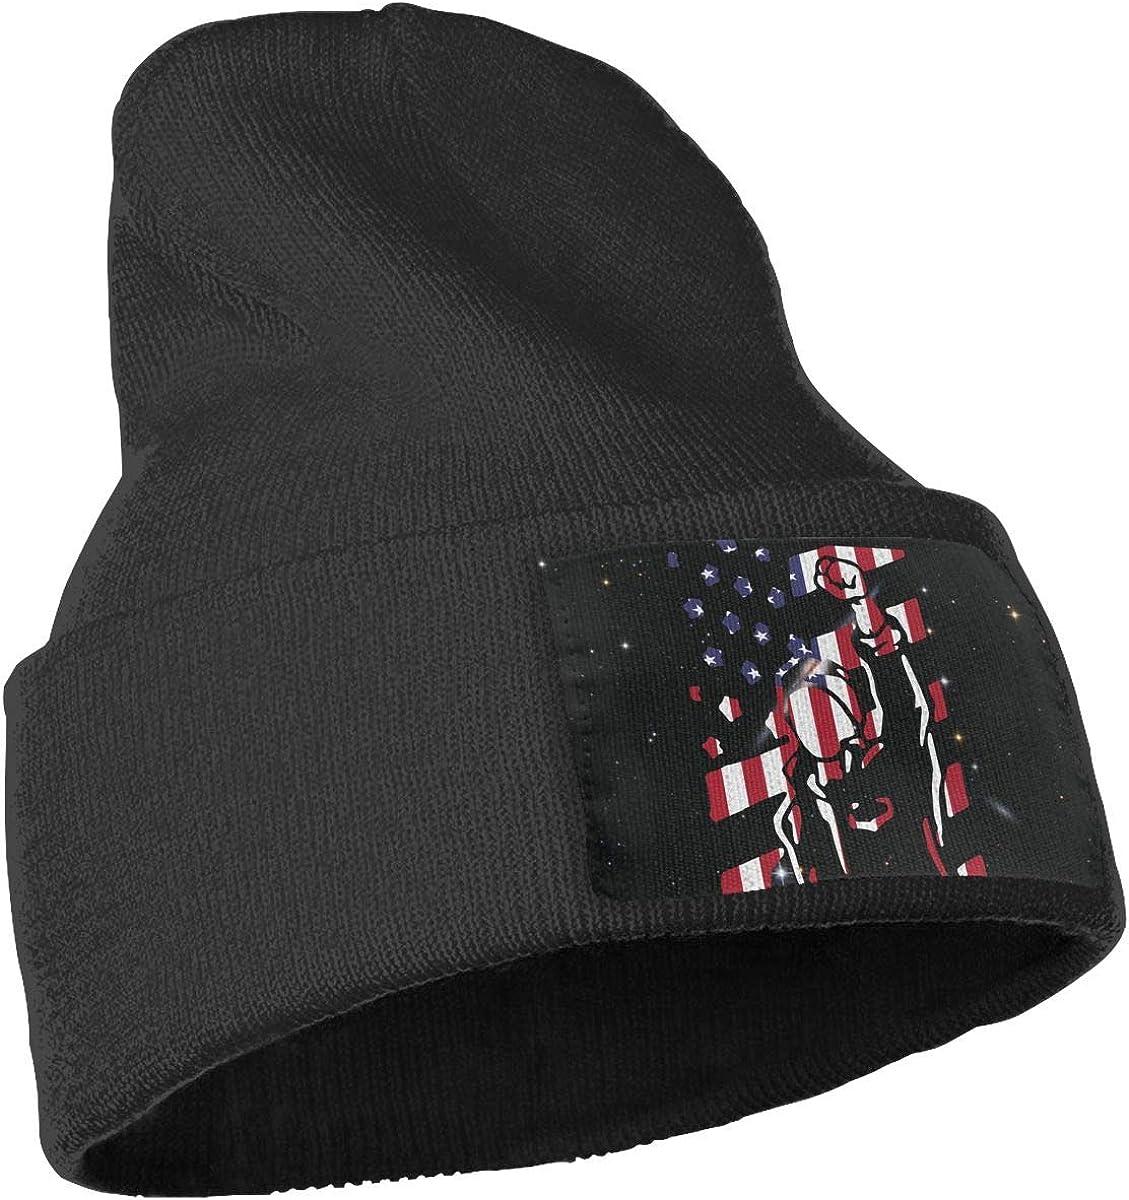 Patriotic USA Flag1 Skull Cap Men Women Knitting Hats Stretchy /& Soft Beanie